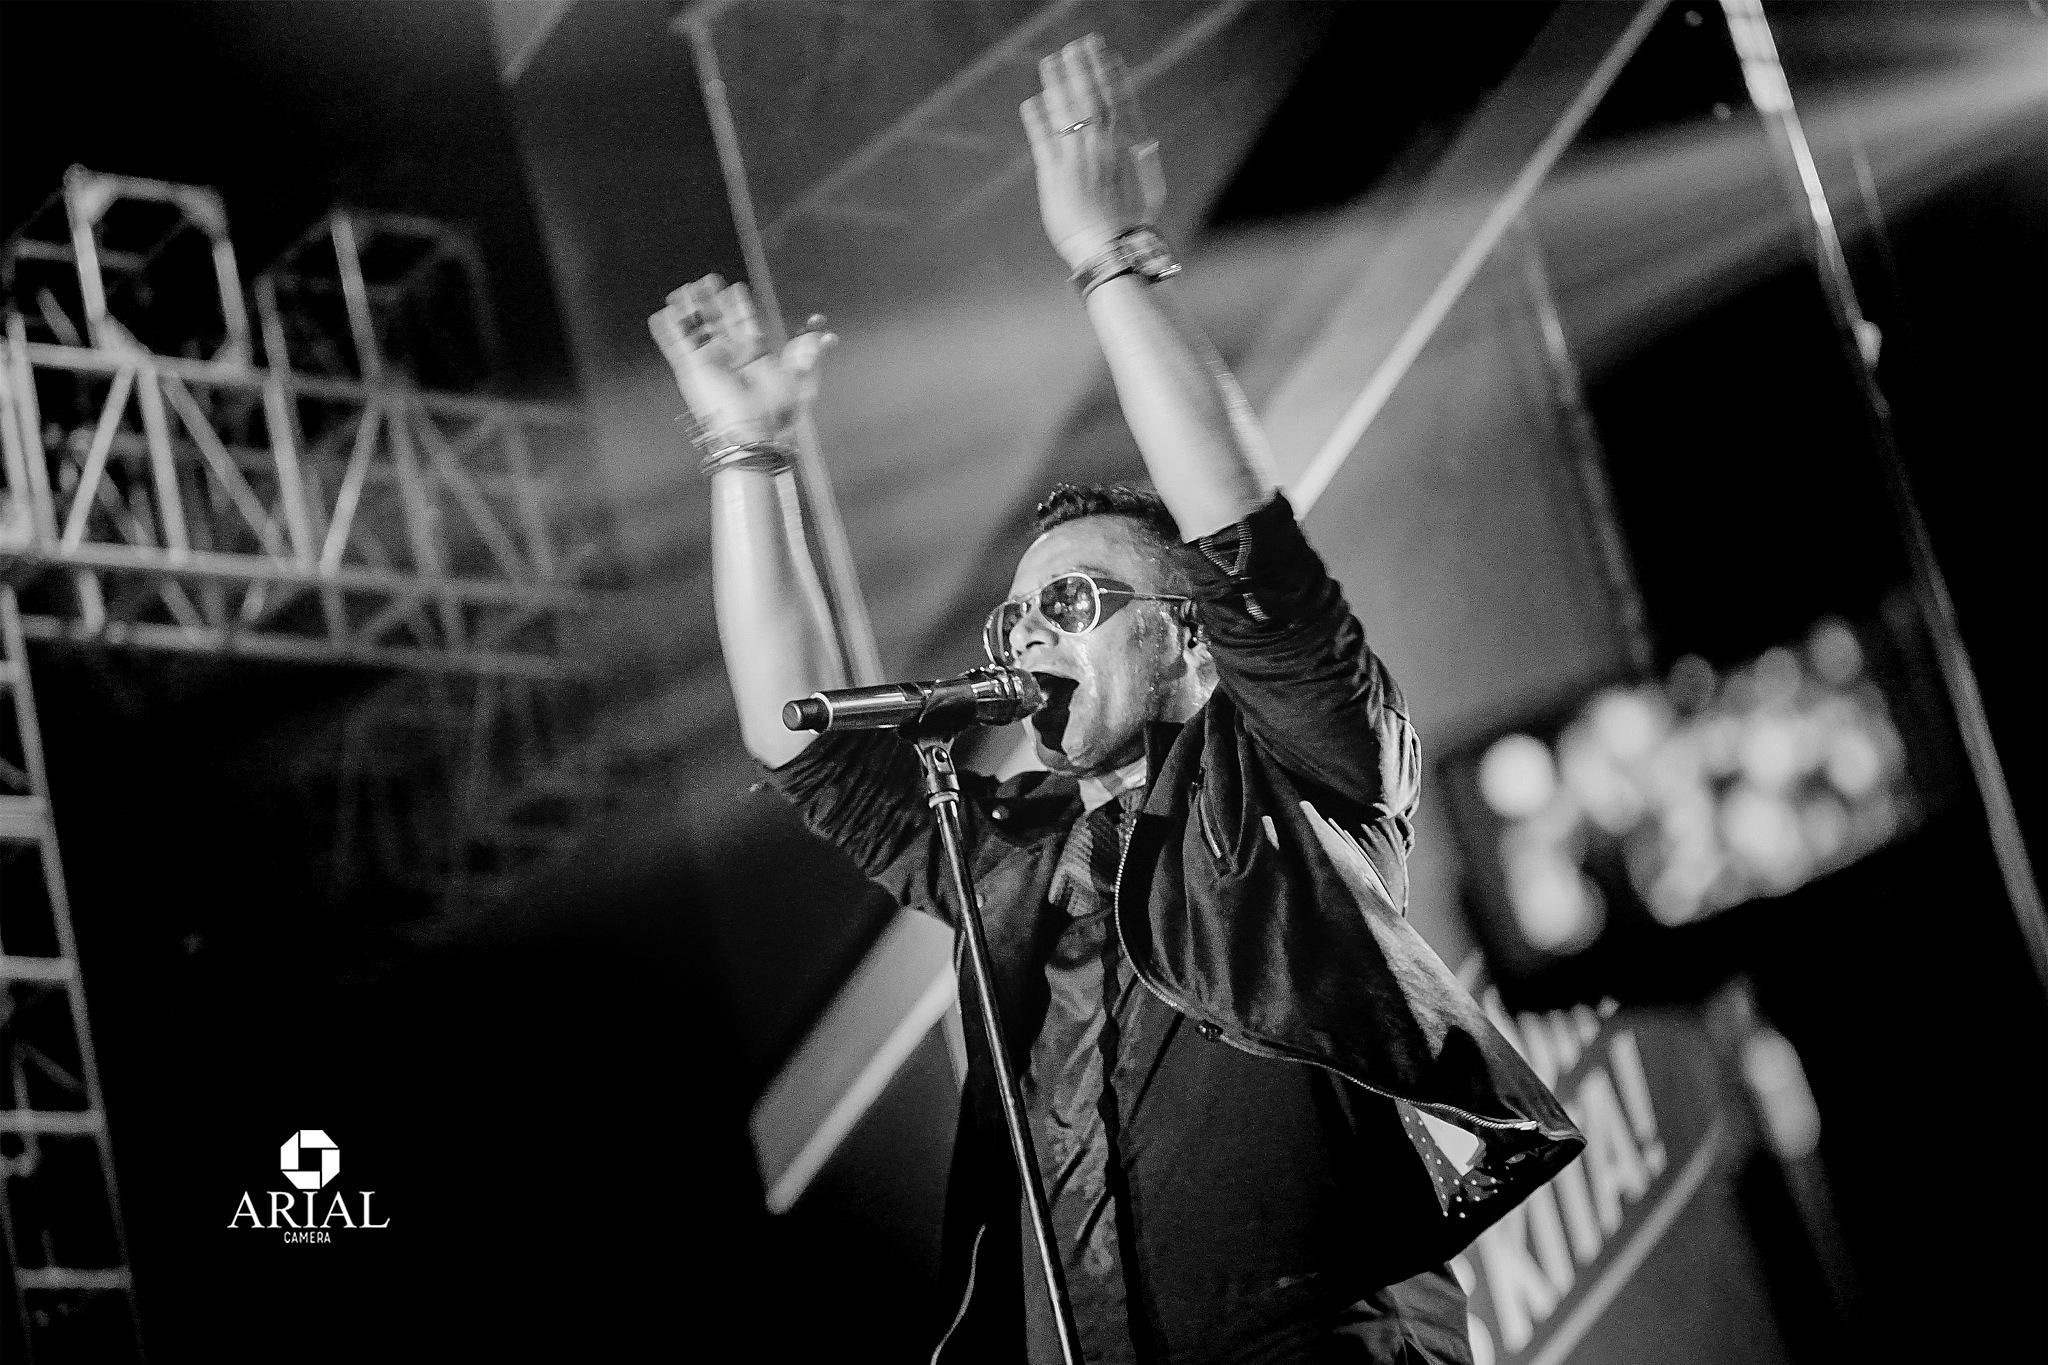 Greatest Moment by Ahmad Kamaluddin Ashari